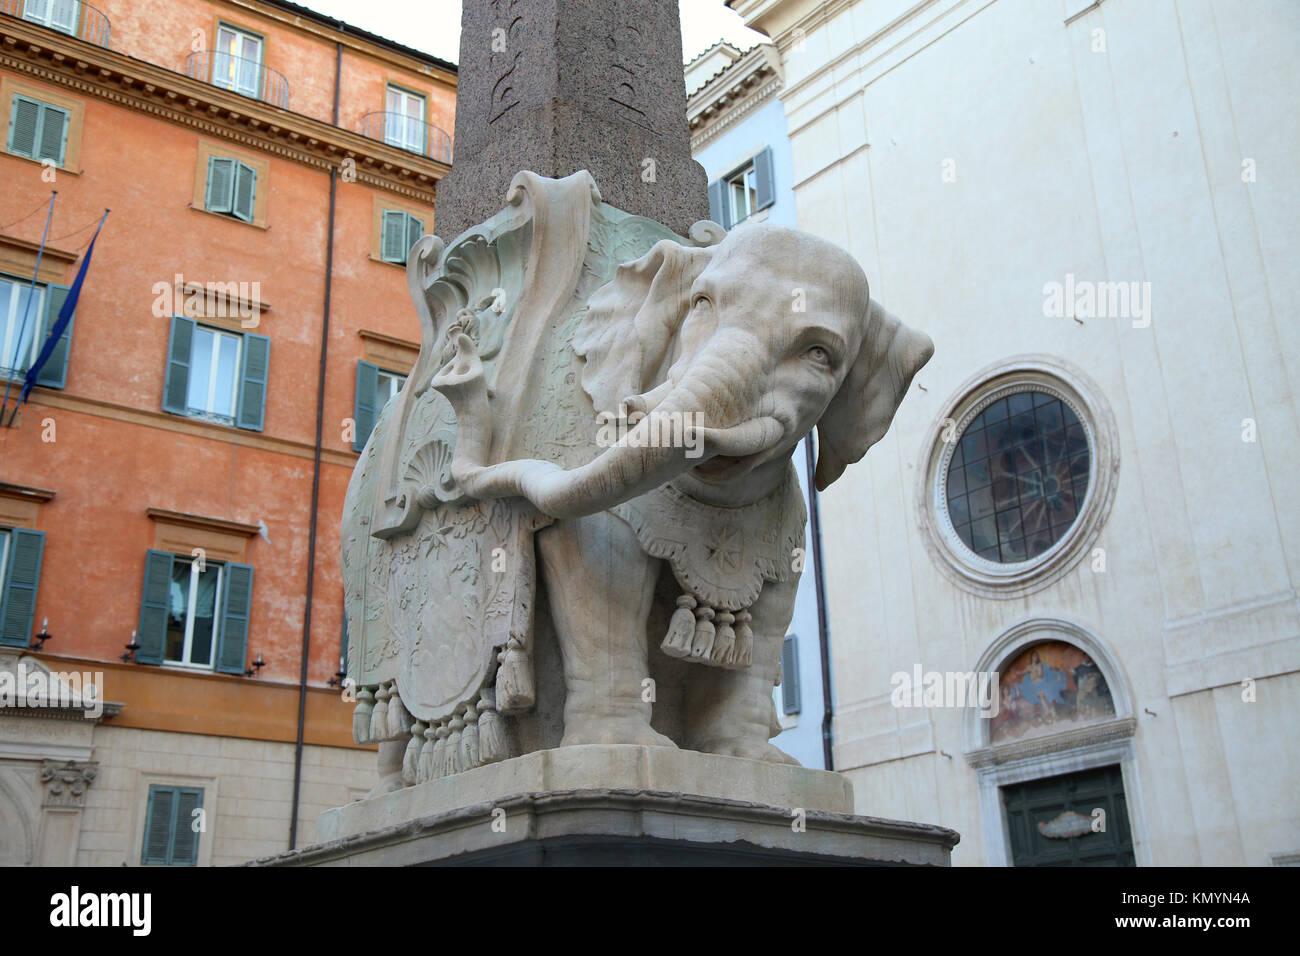 Monument of Elephant by Bernini on Piazza della Minerva in Rome, Italy Stock Photo